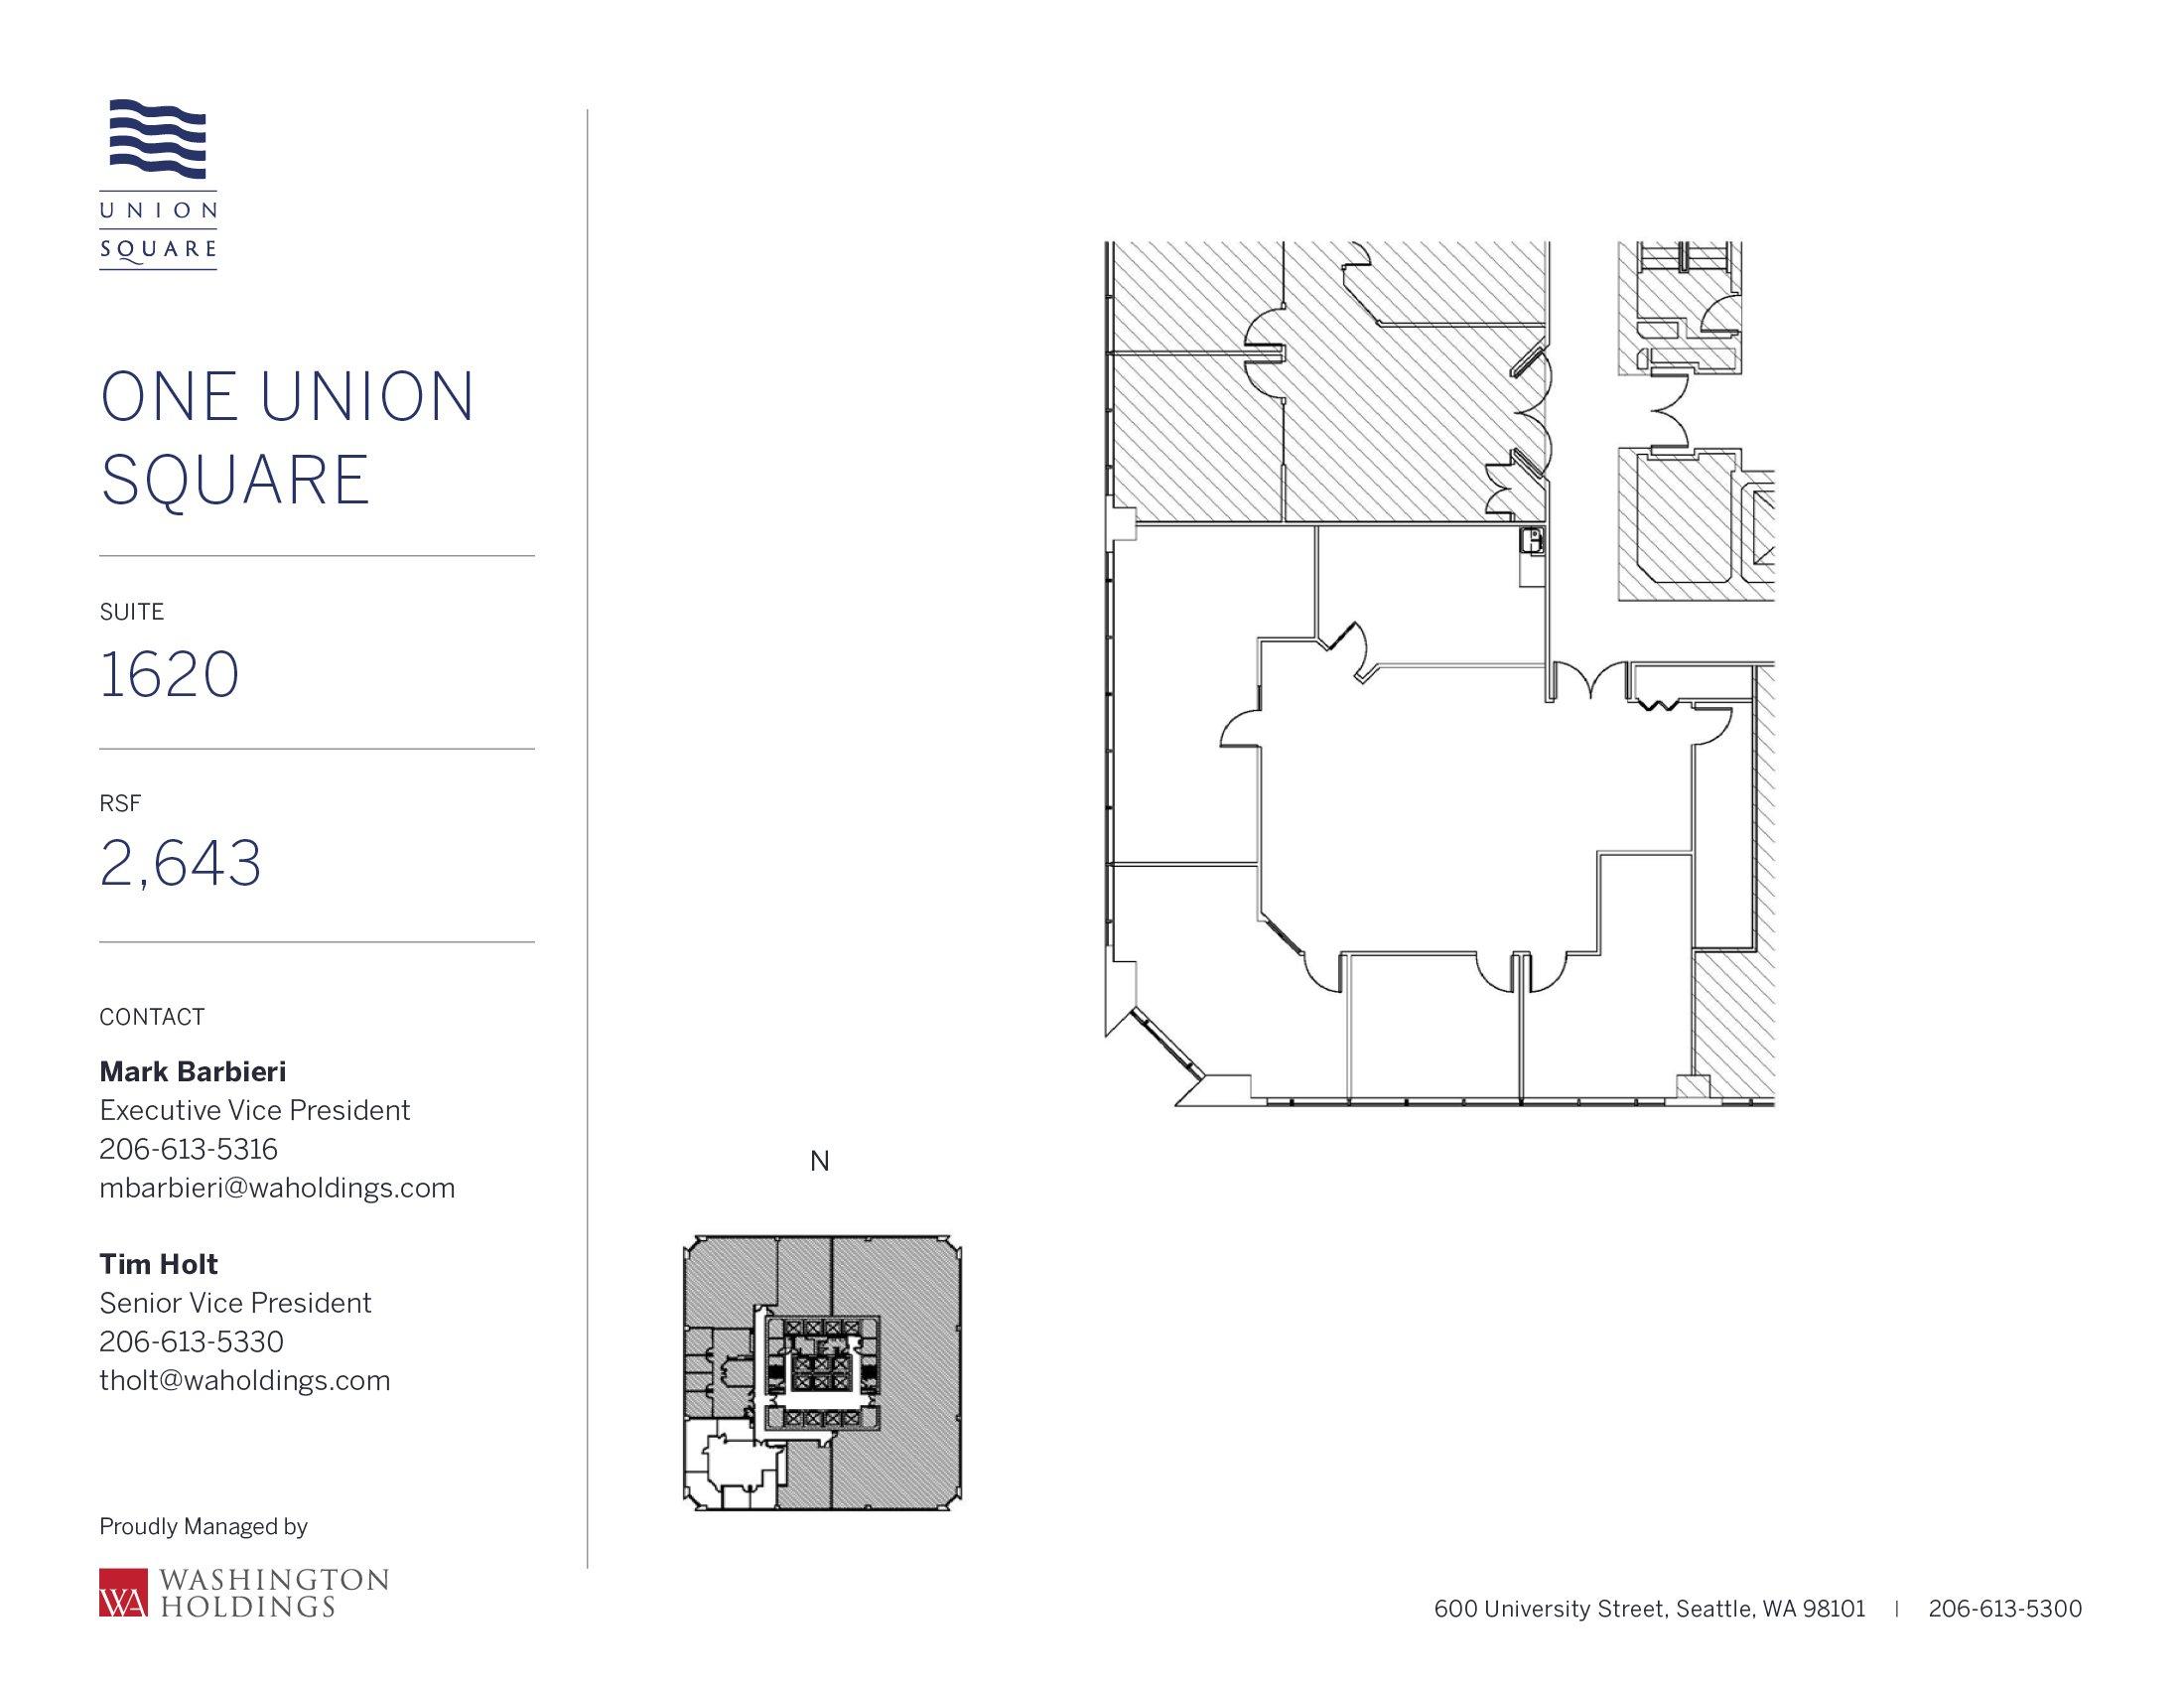 Image of One Union Square, floor 16